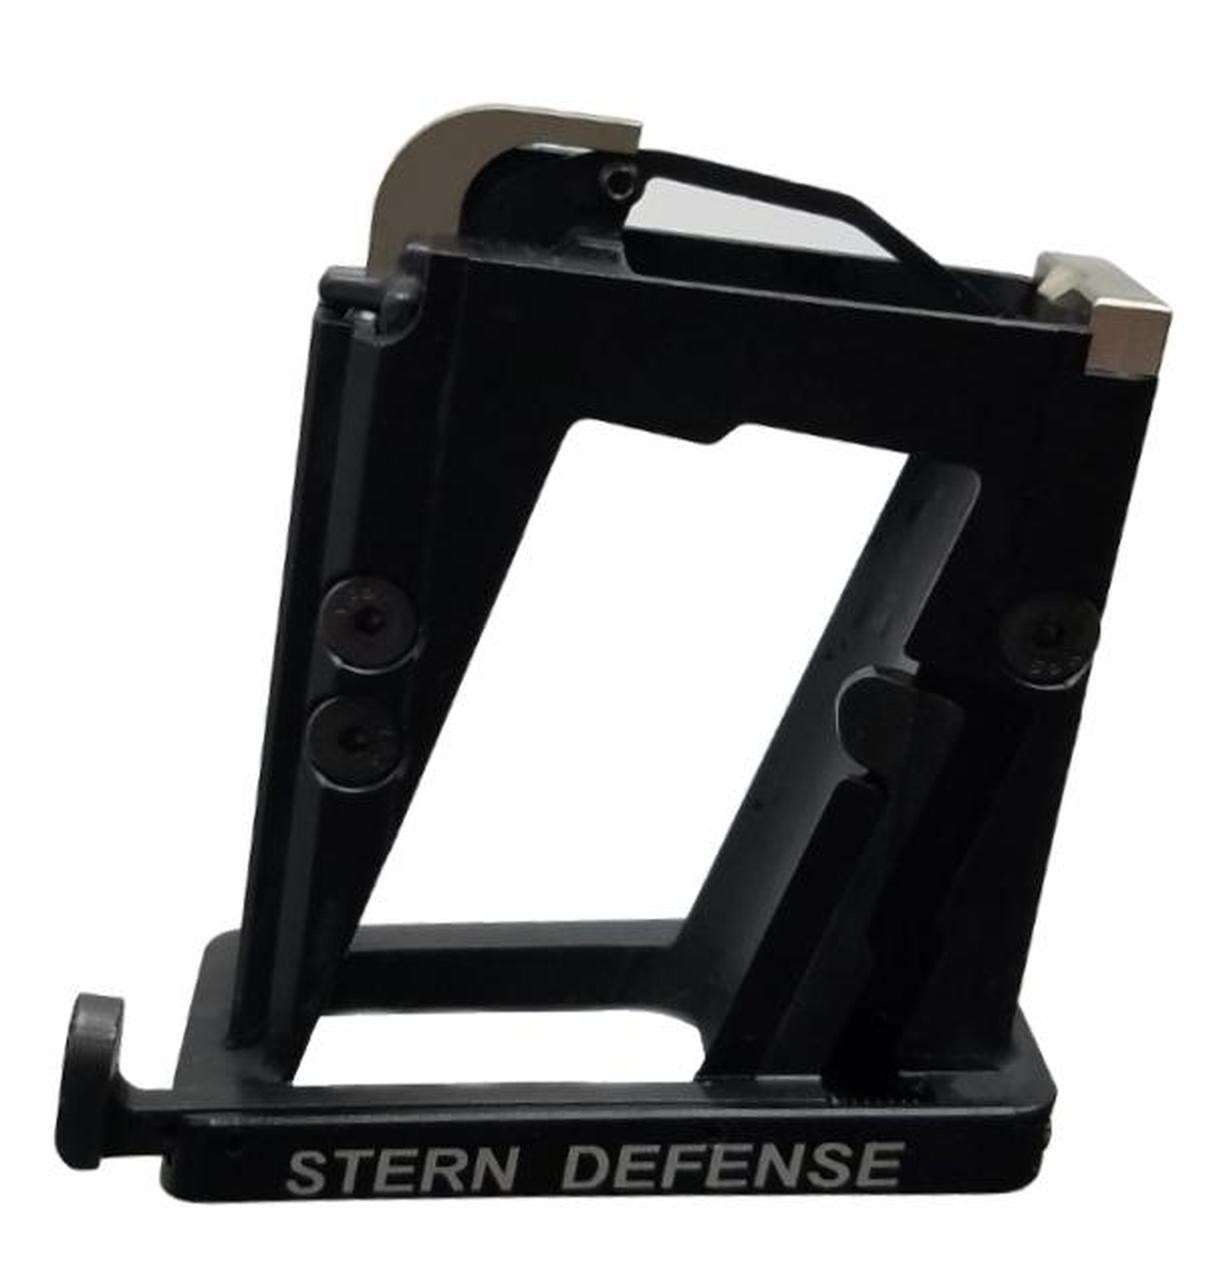 "Stern Defense Key Components 10.5"" Barrel Kit (45ACP - M&P mag)"